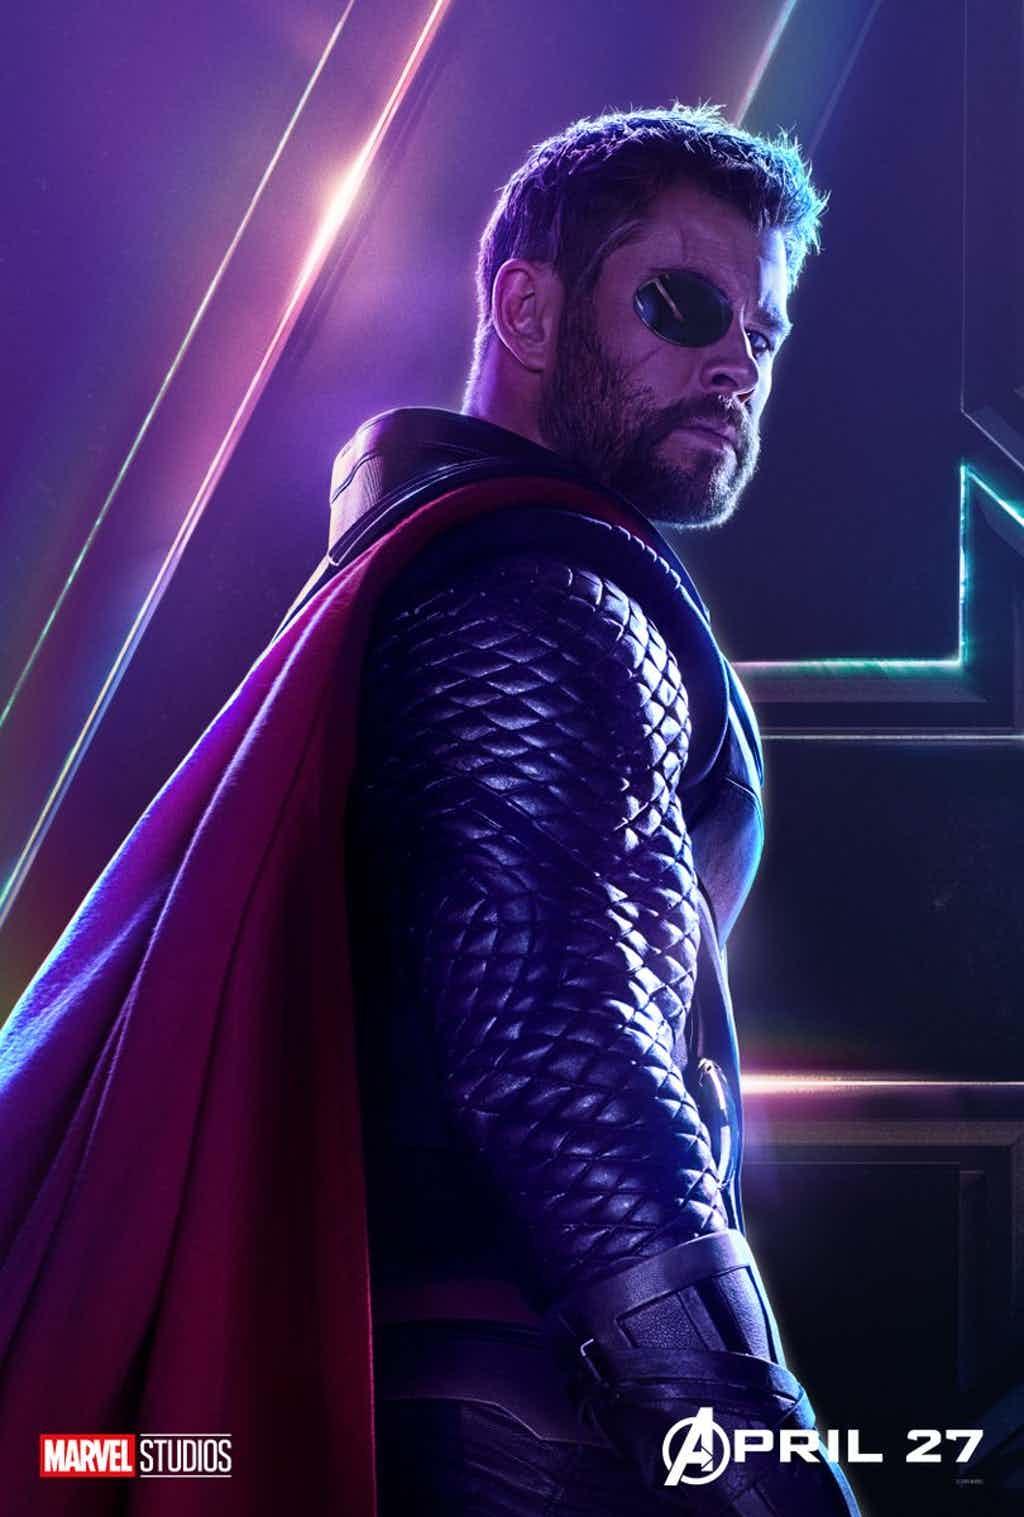 szmk_marvel_infinity_war_vegtelen_haboru_bosszuallok_avengers_ironman_hulk_thor_captainamaerica_guardians_galaxy_17.jpg